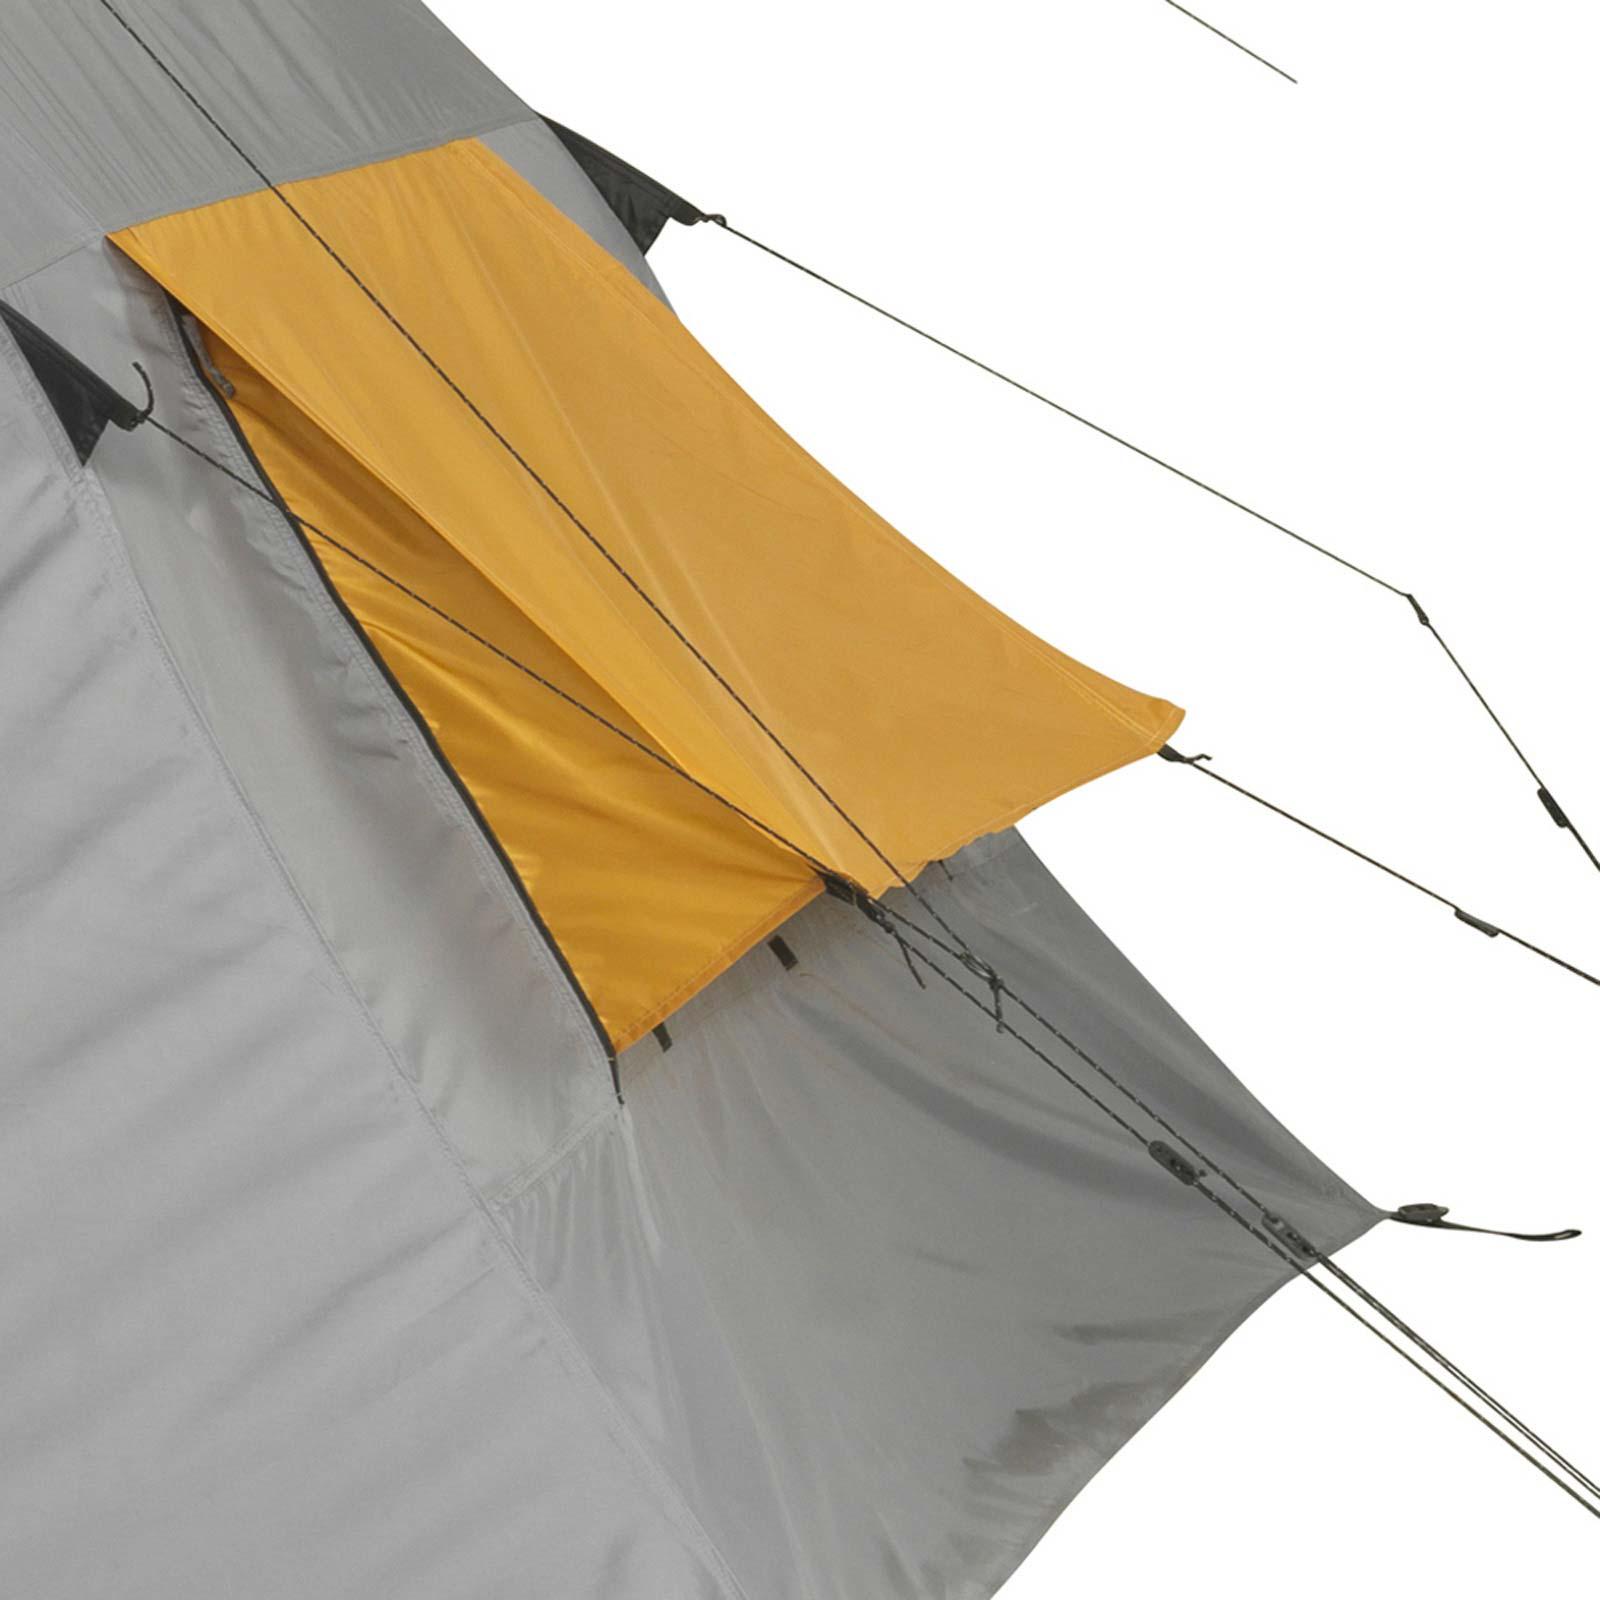 Tipi Zelt 8 Personen : Tipi zelt für personen grand canyon tepee tipizelt